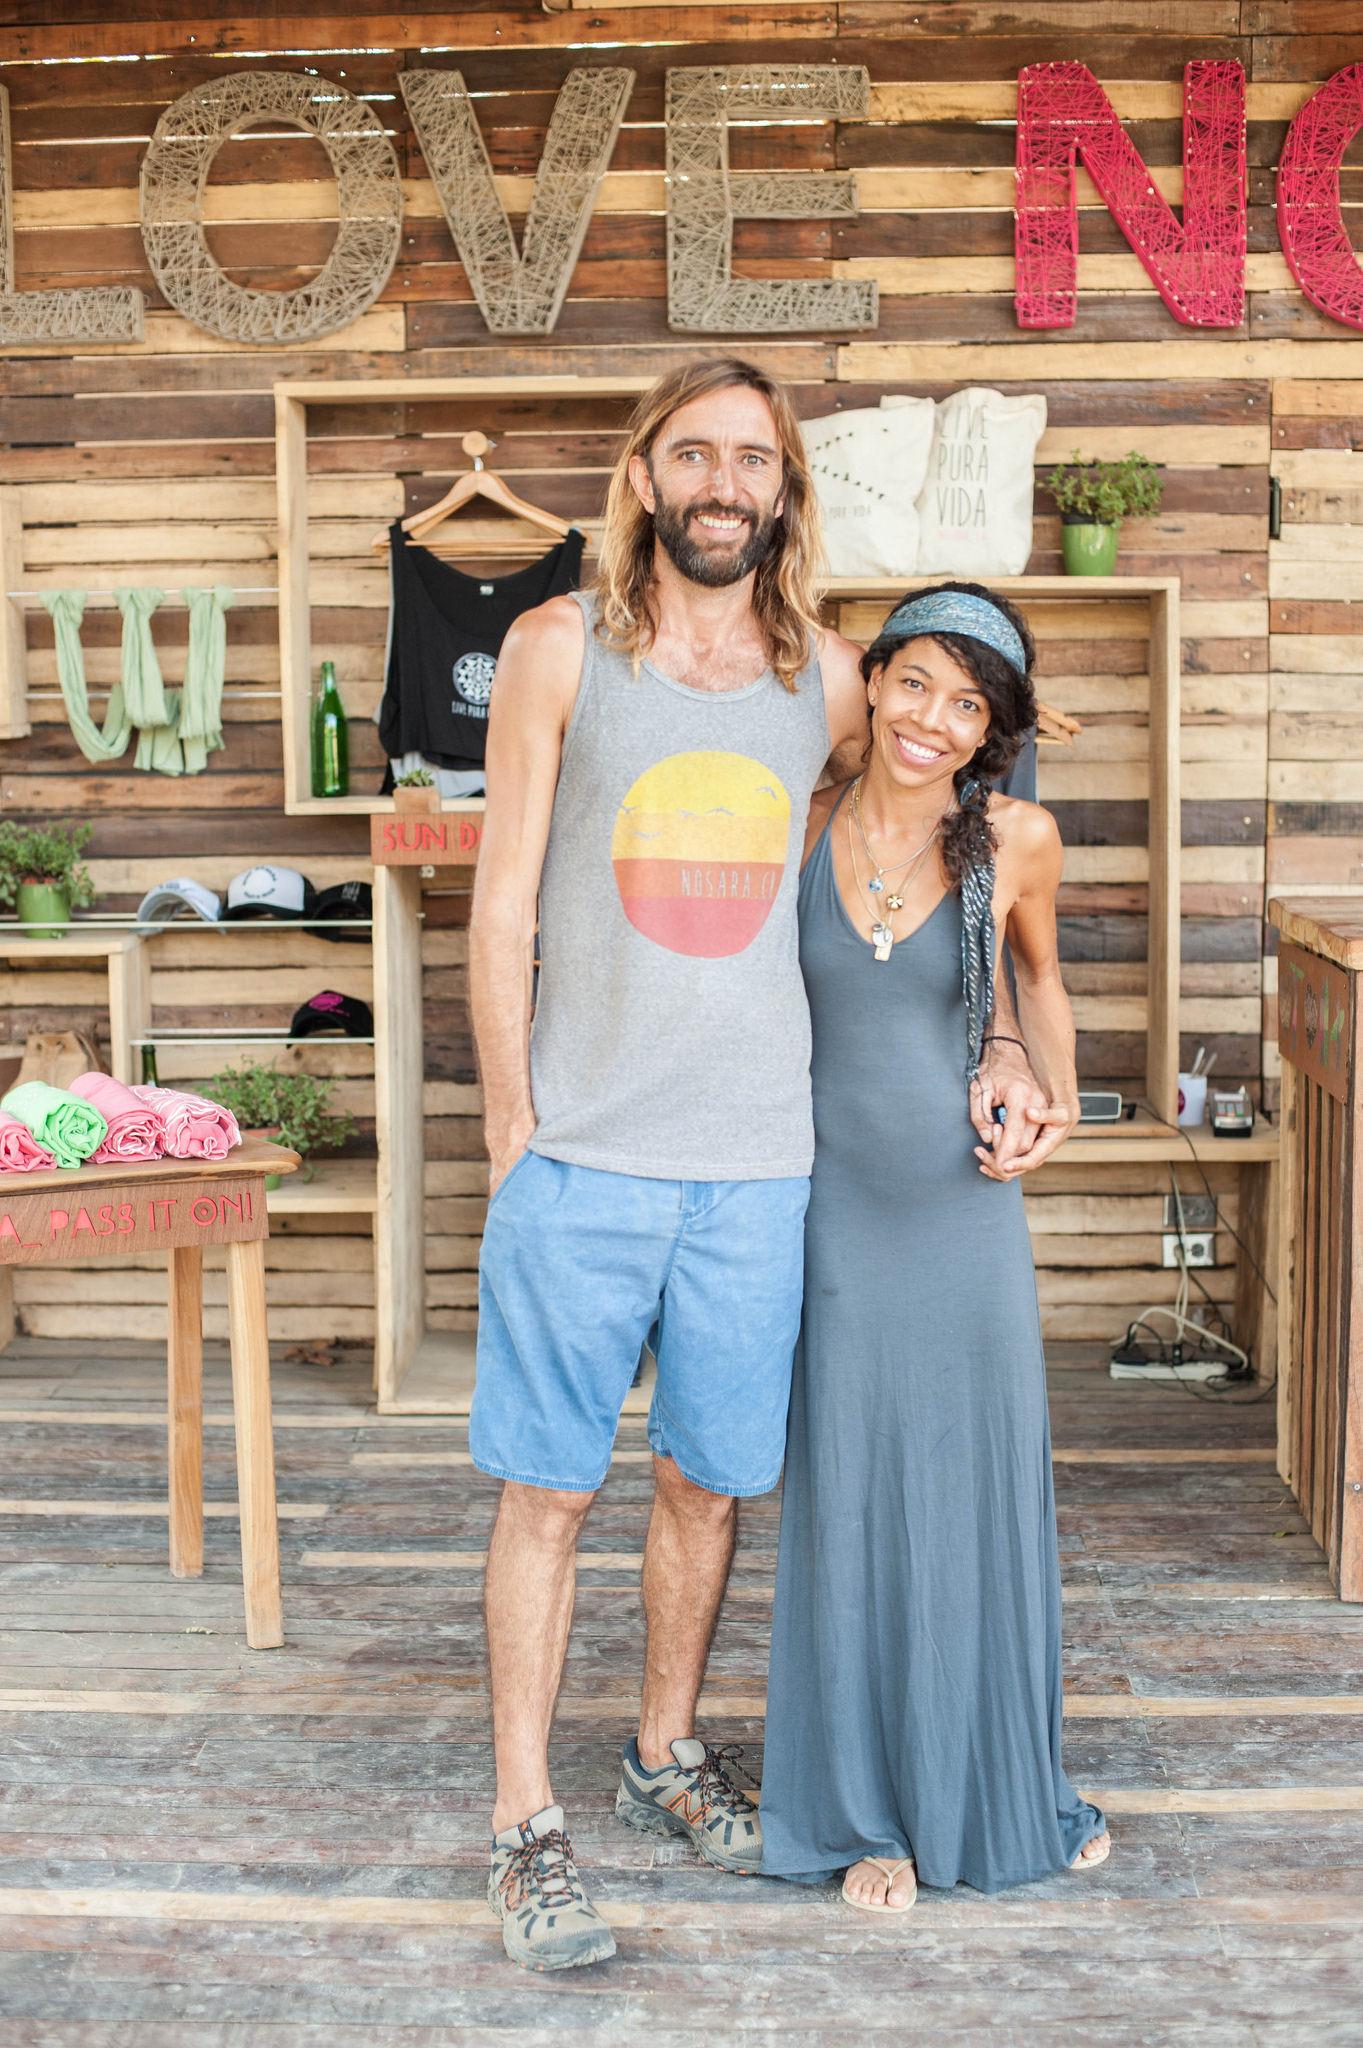 Susana Brown and Manolo Jaramillo, owners of Love Nosara